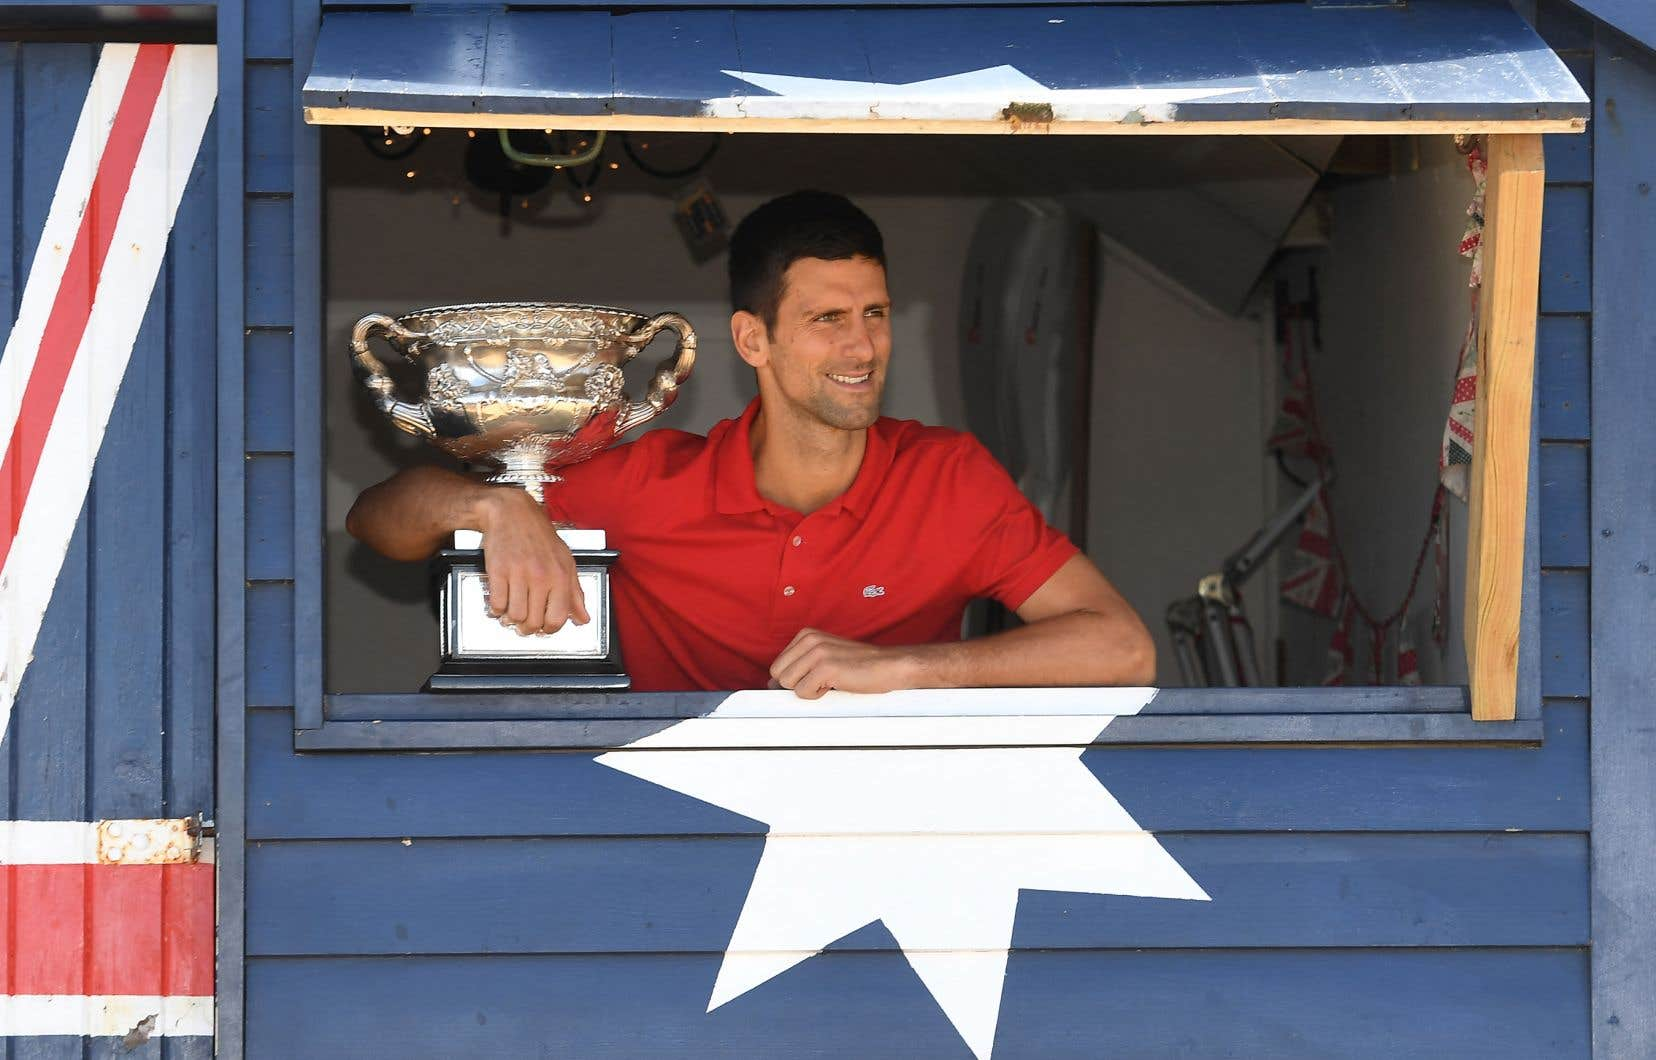 Le joueur de tennis,Novak Djokovic